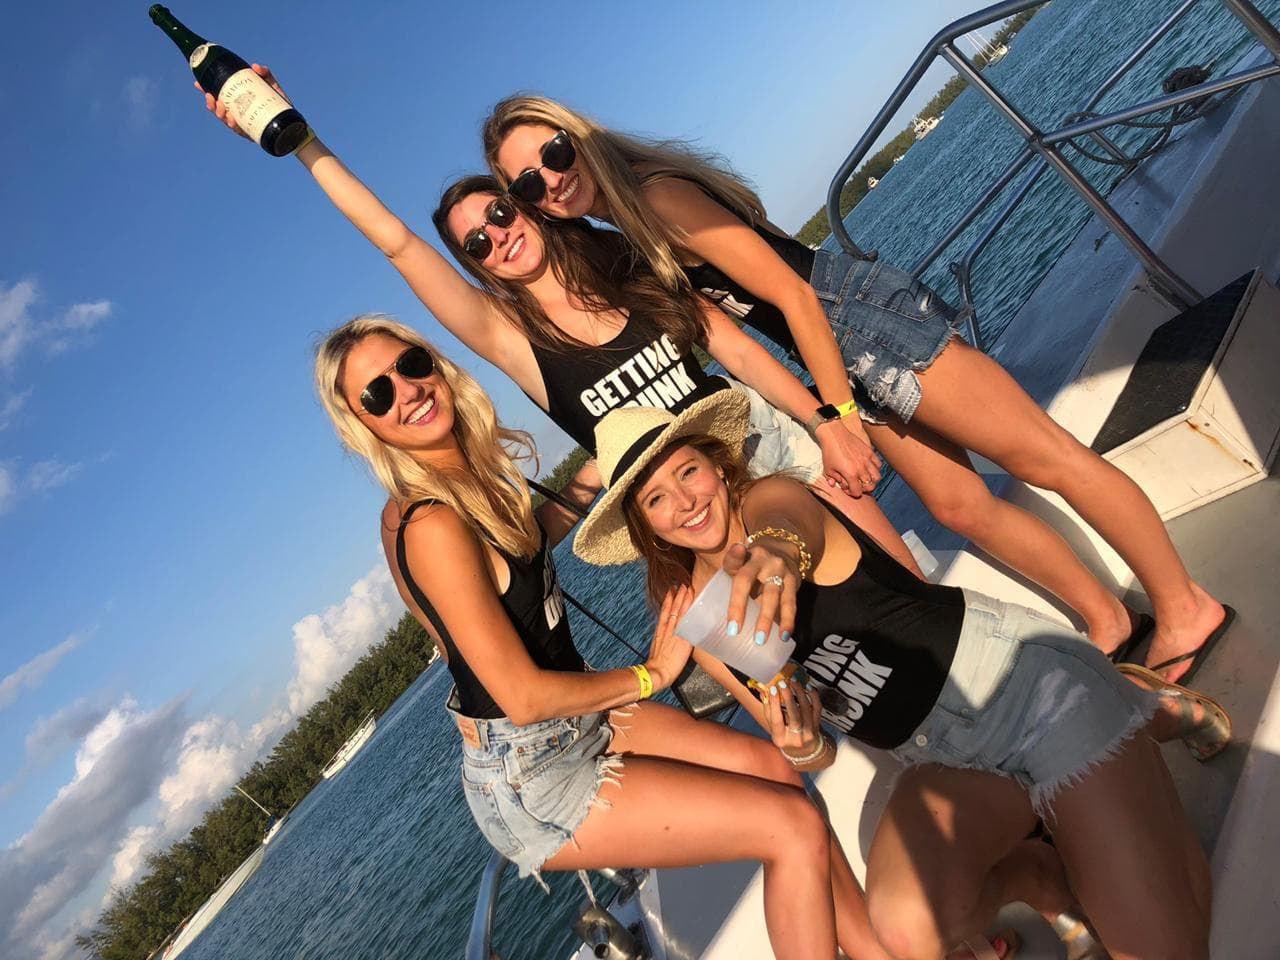 Bachelorette Party Boat Miami | Booze Cruise- Miami Turn Up Entertainment